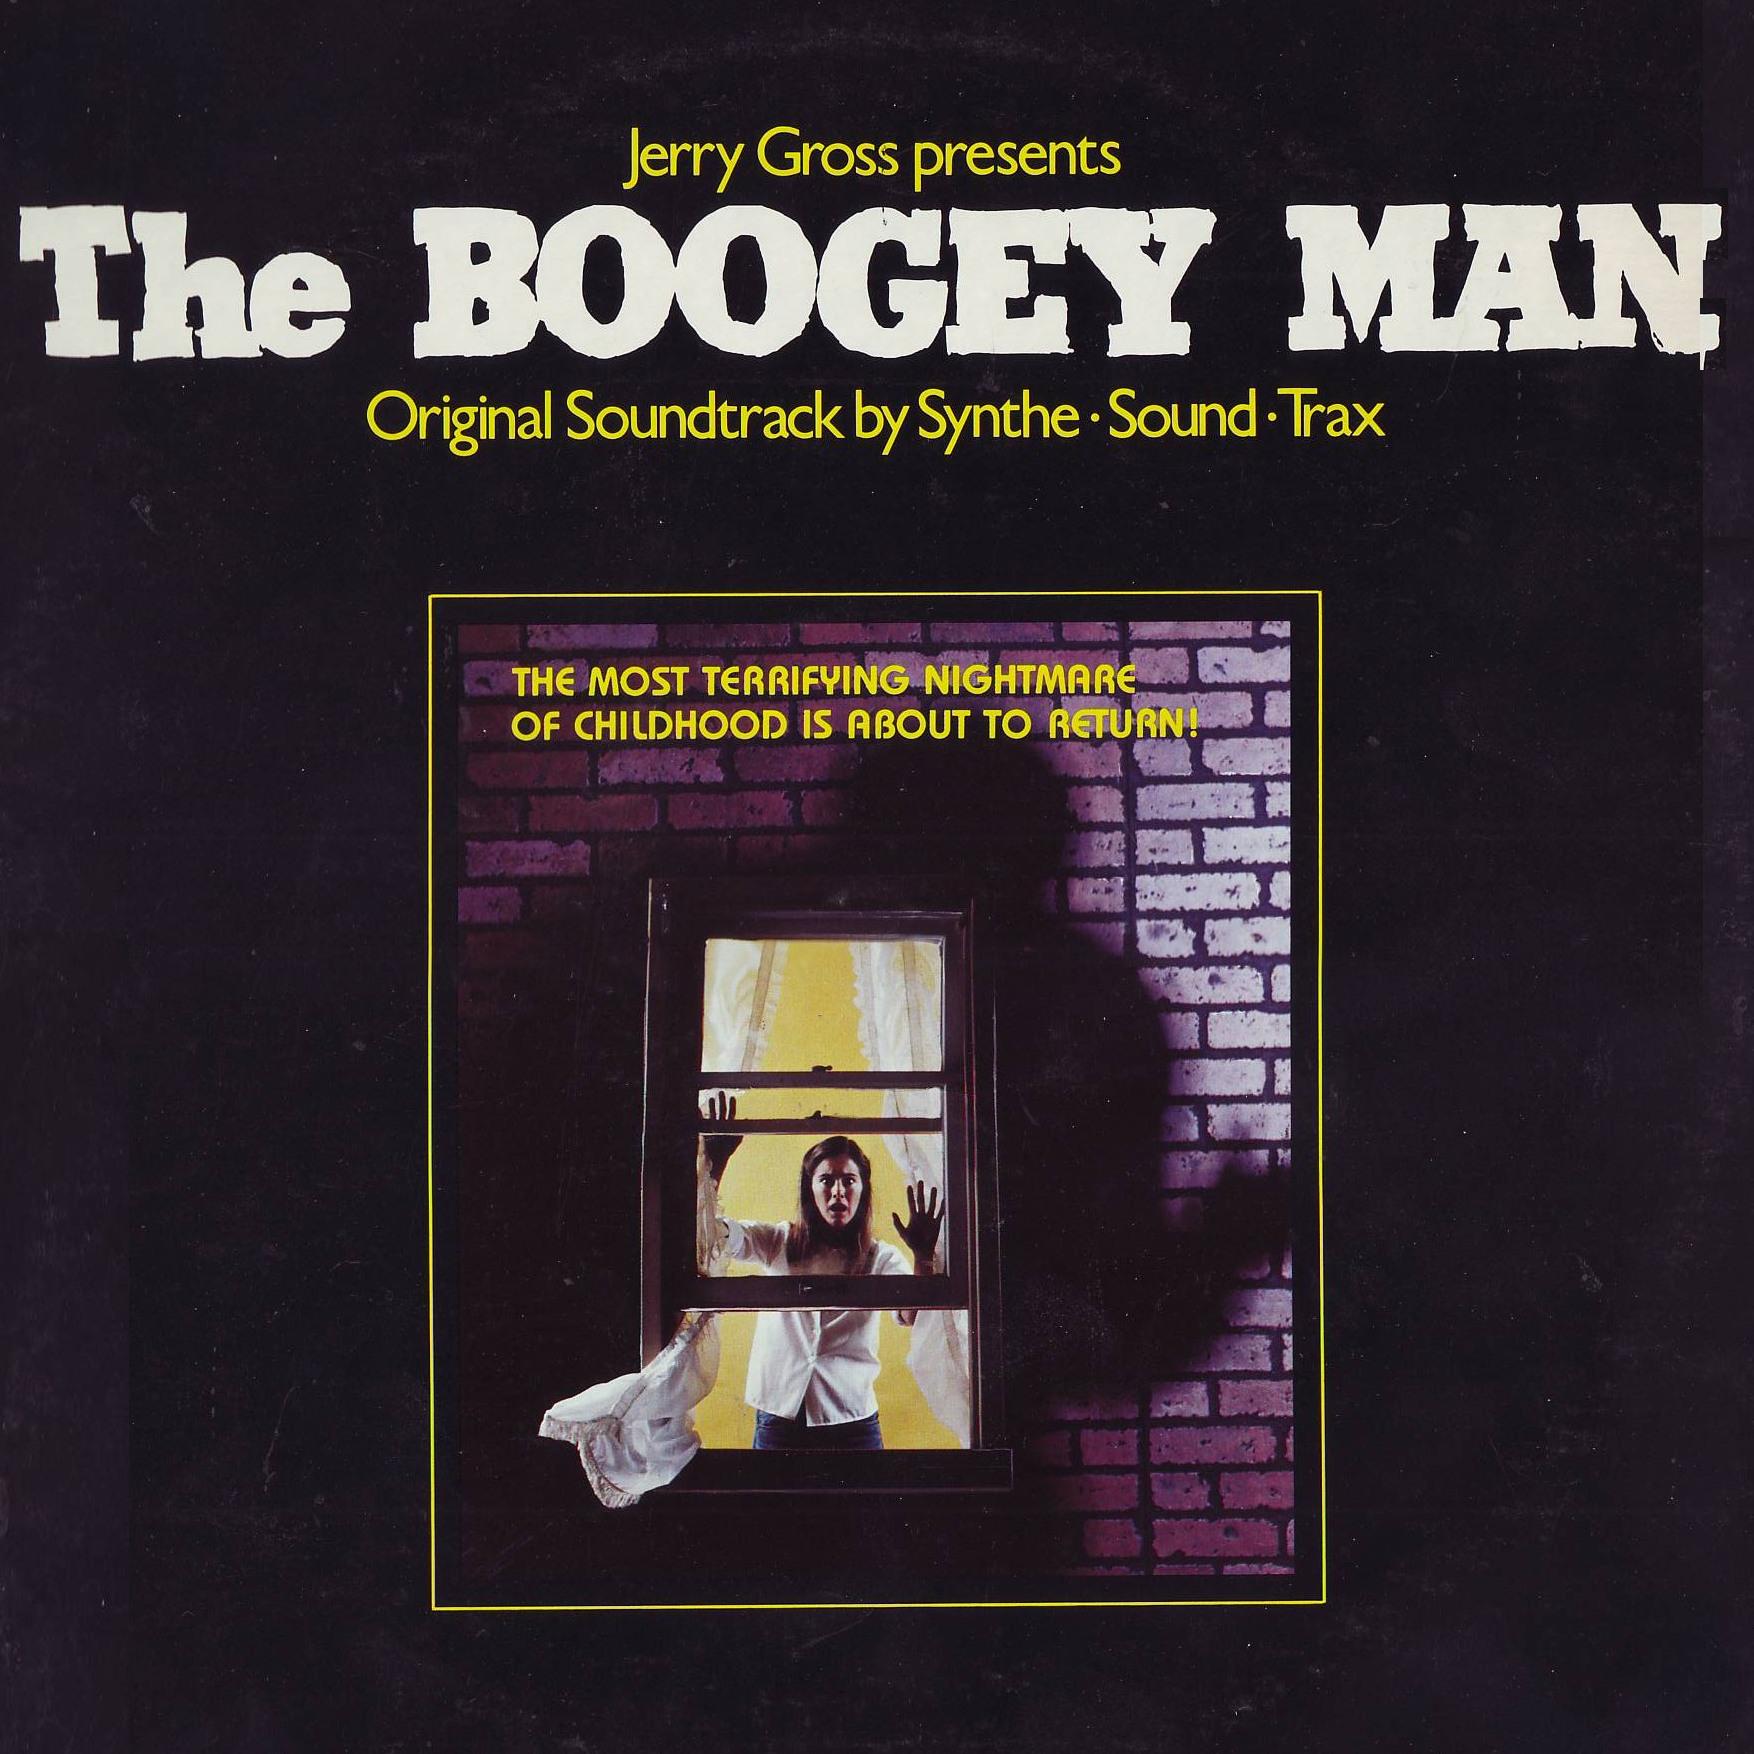 boogey-man-lp-cover